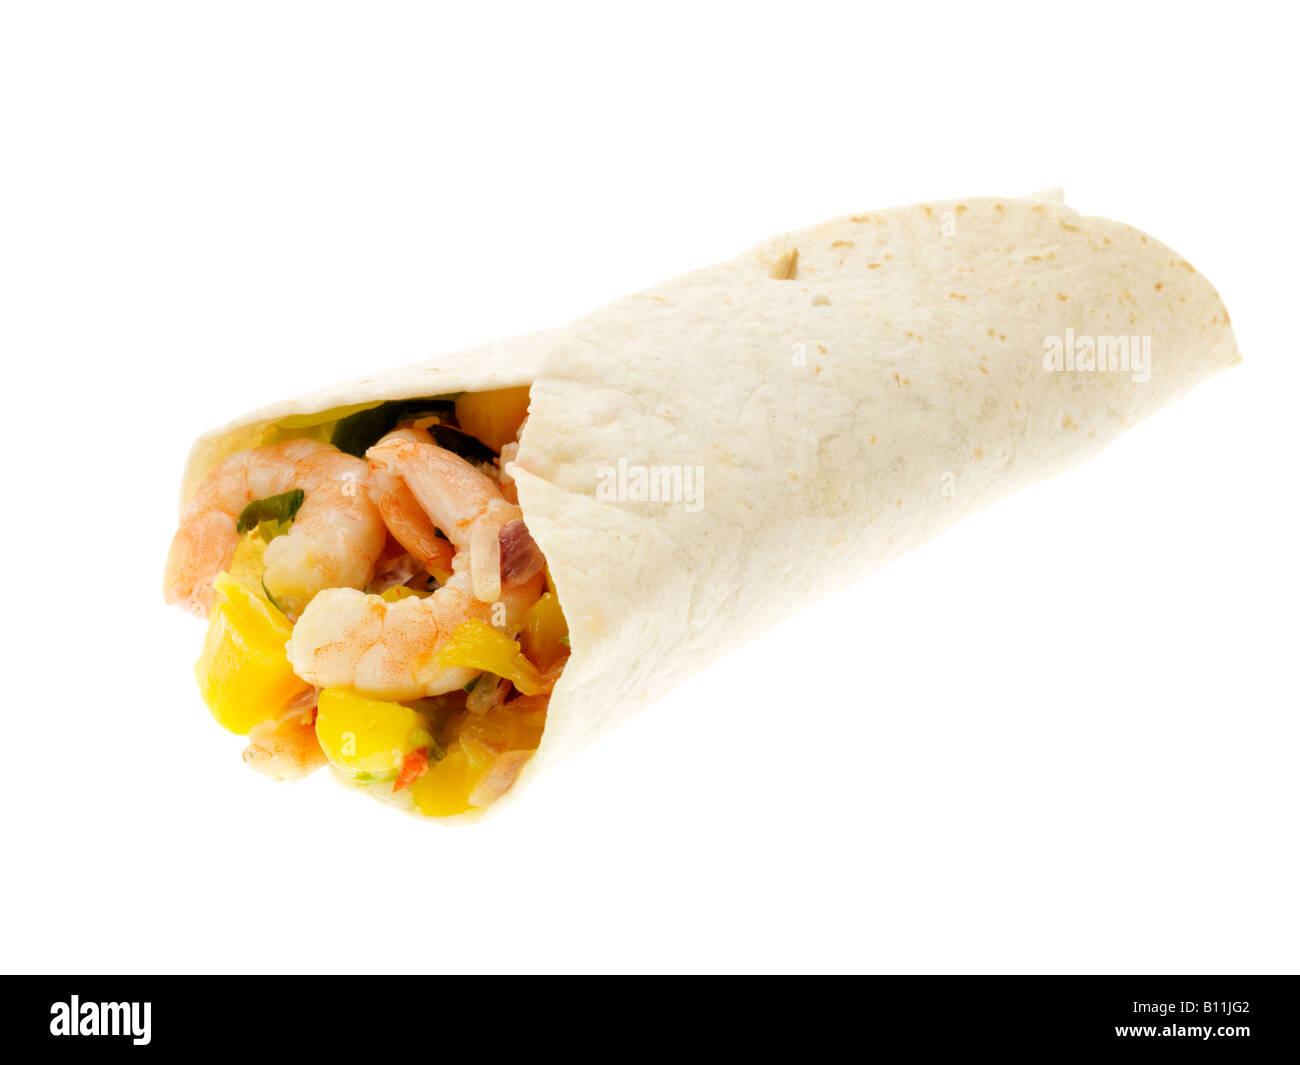 Spicy Prawn Burrito - Stock Image